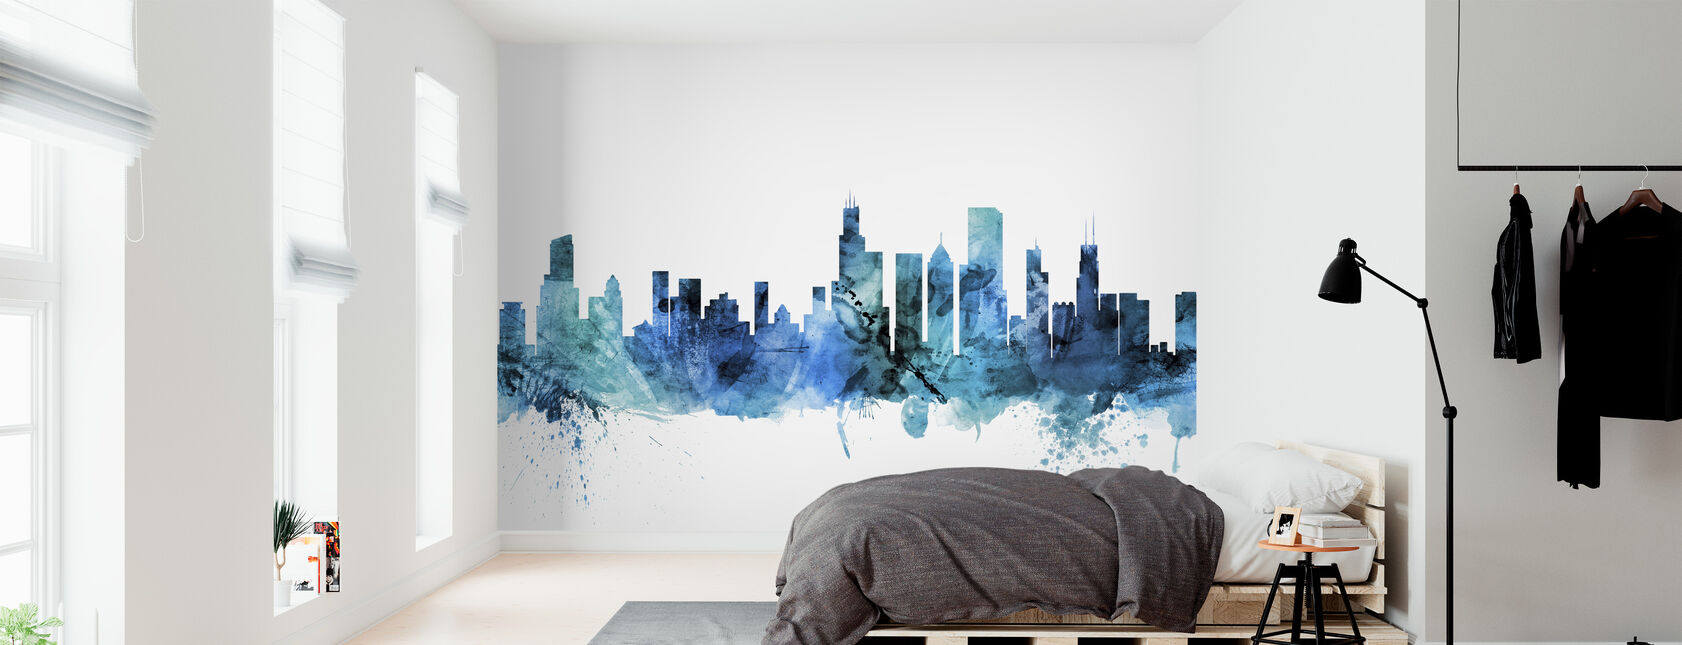 Chicago Illinois Skyline - Wallpaper - Bedroom